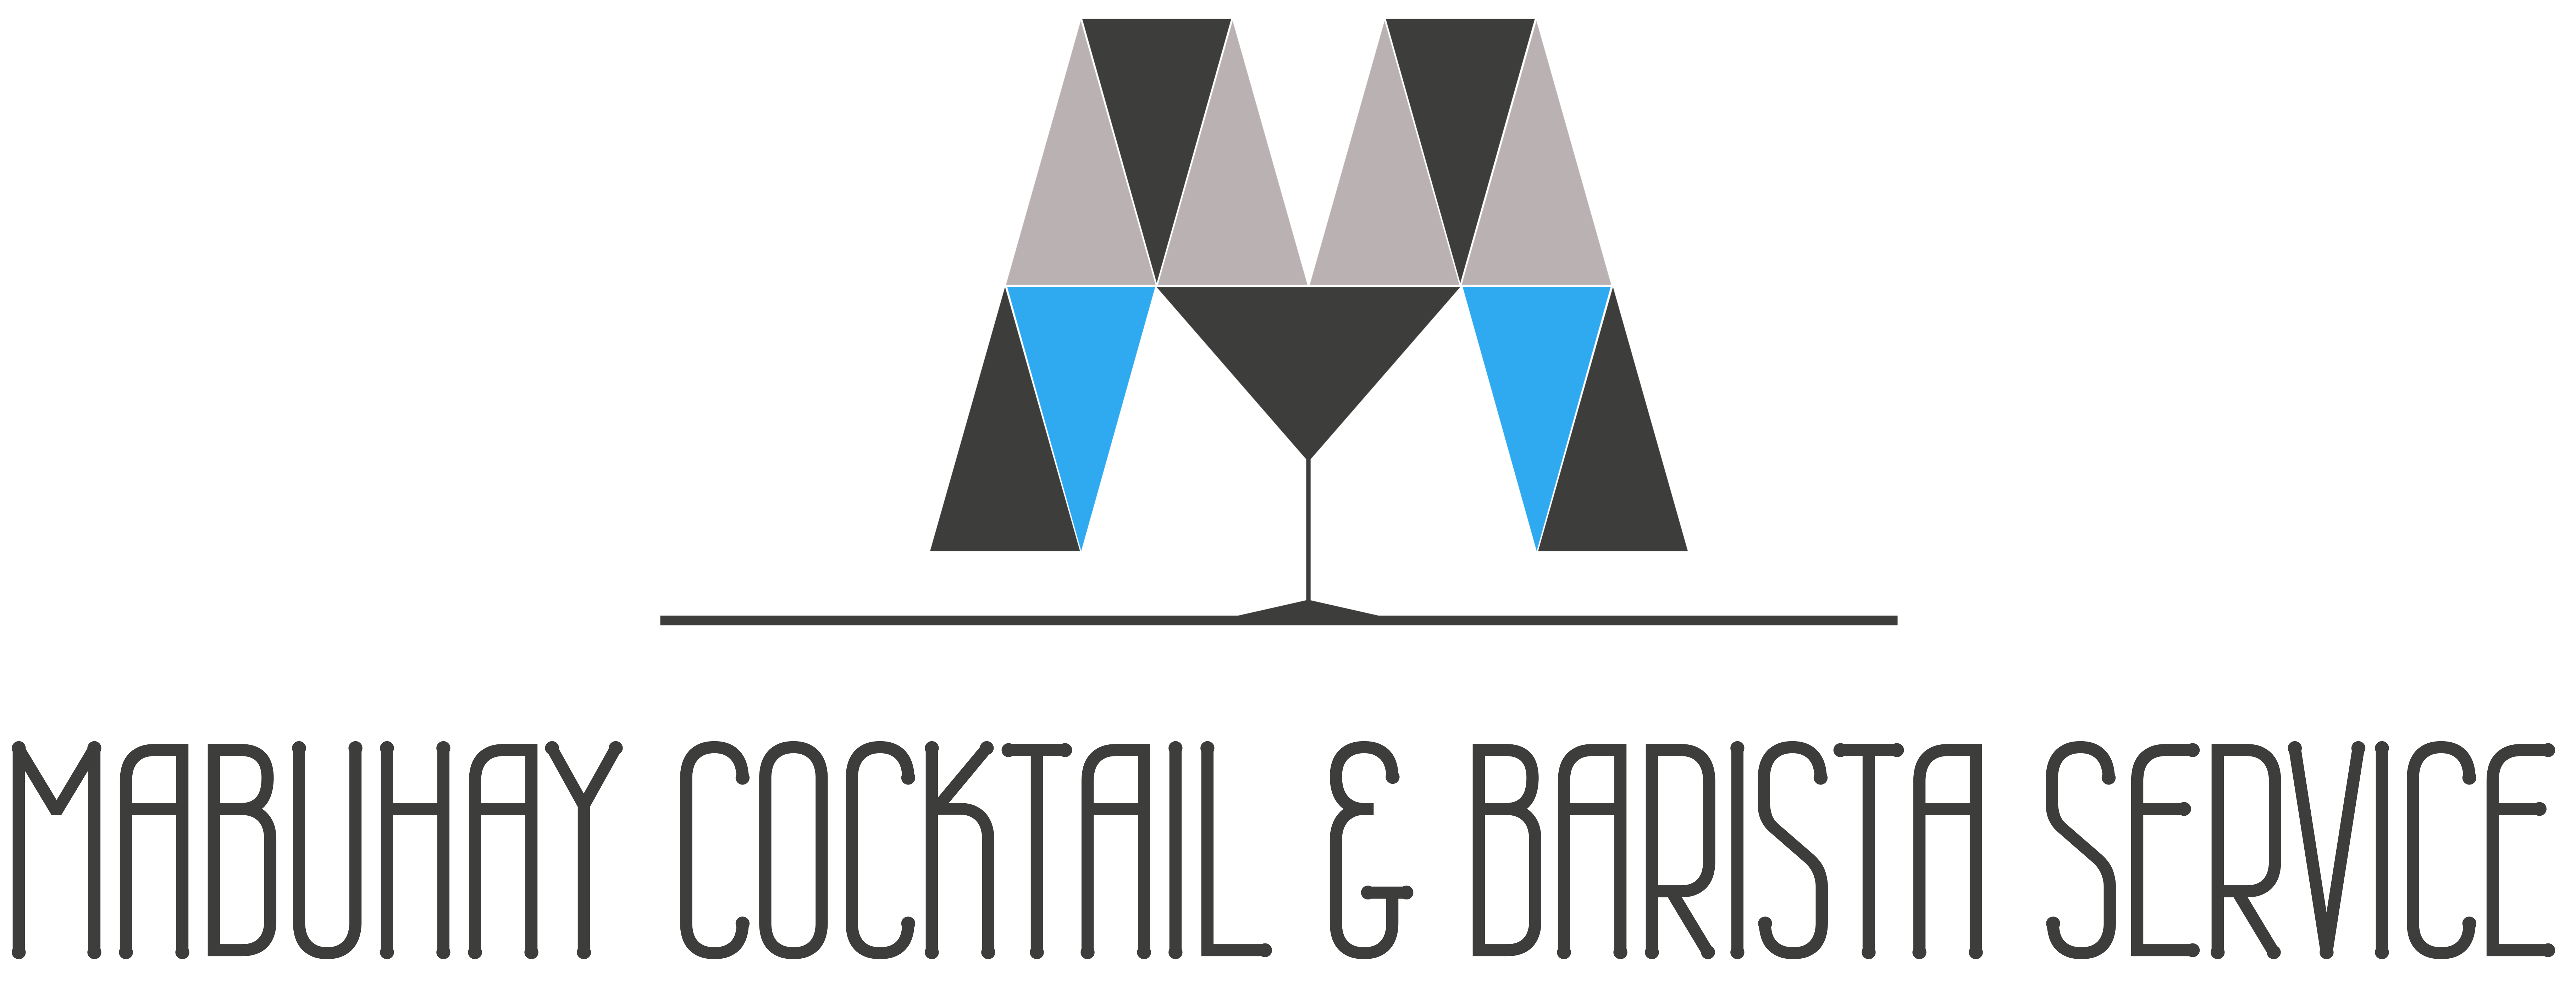 Mabuhay Cocktail & Barista Service